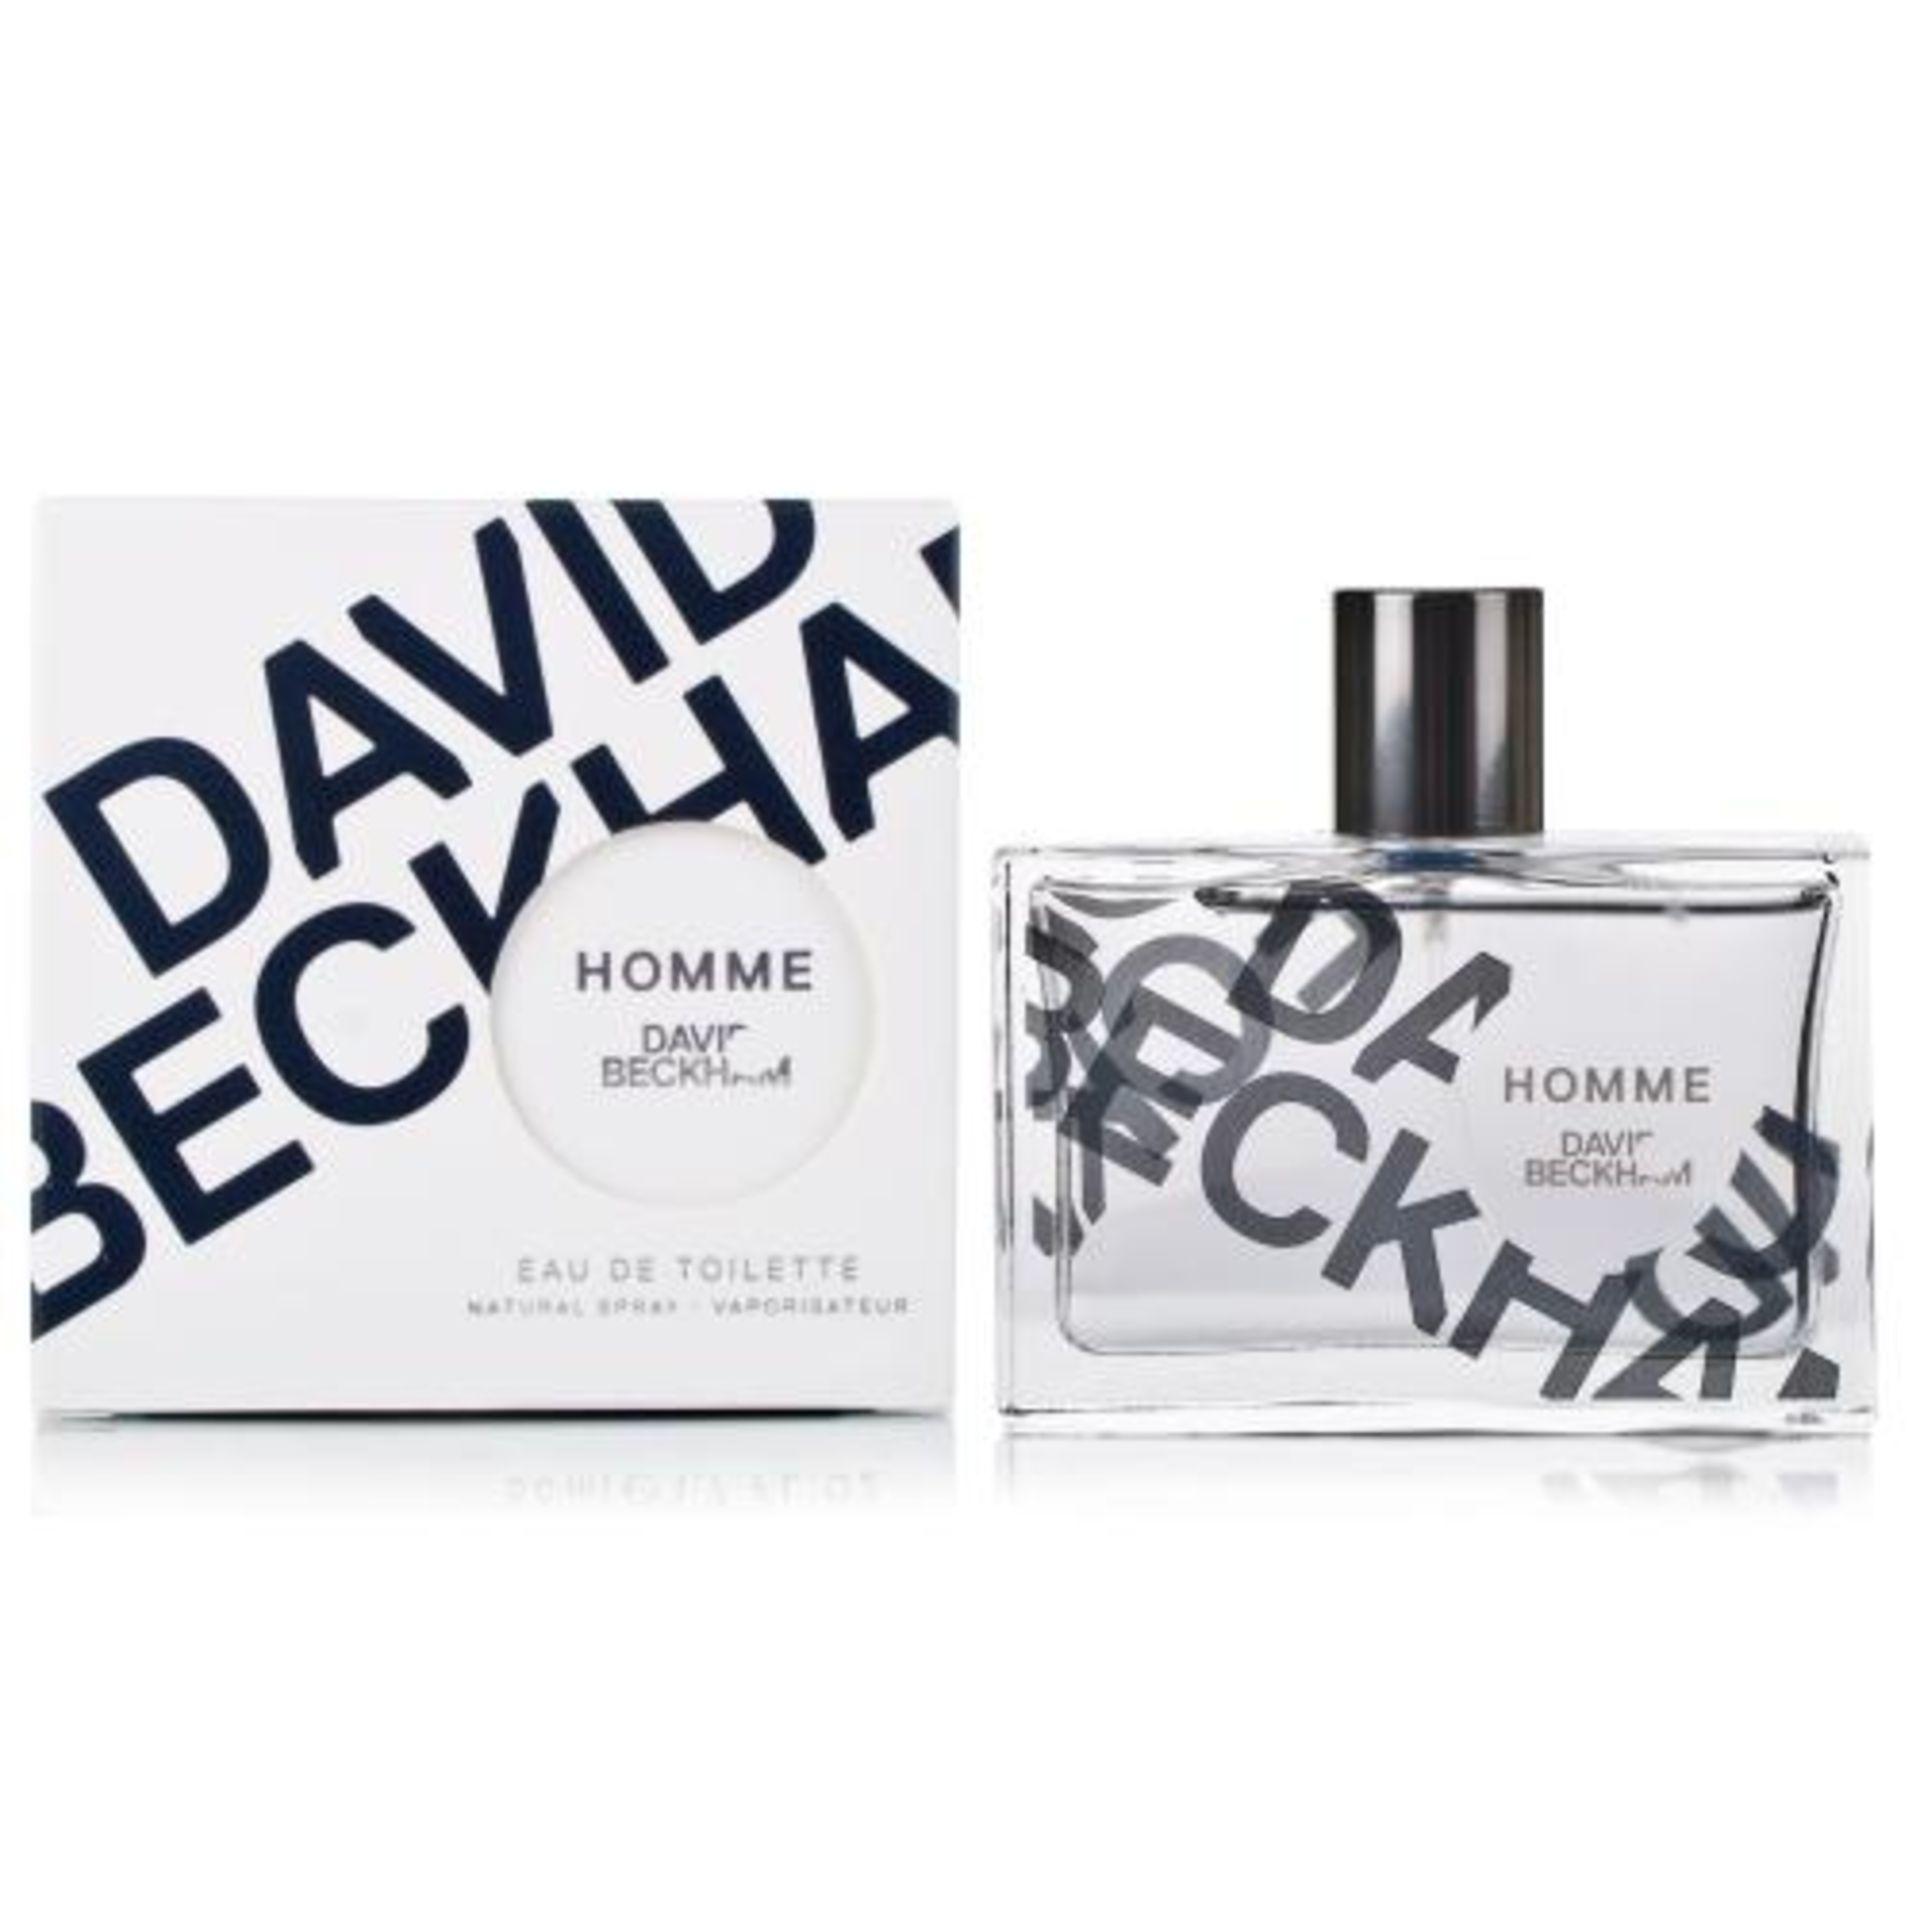 + VAT Brand New Homme By David Beckham Eau De Toilette Spray 75ml Boots Price £34.00